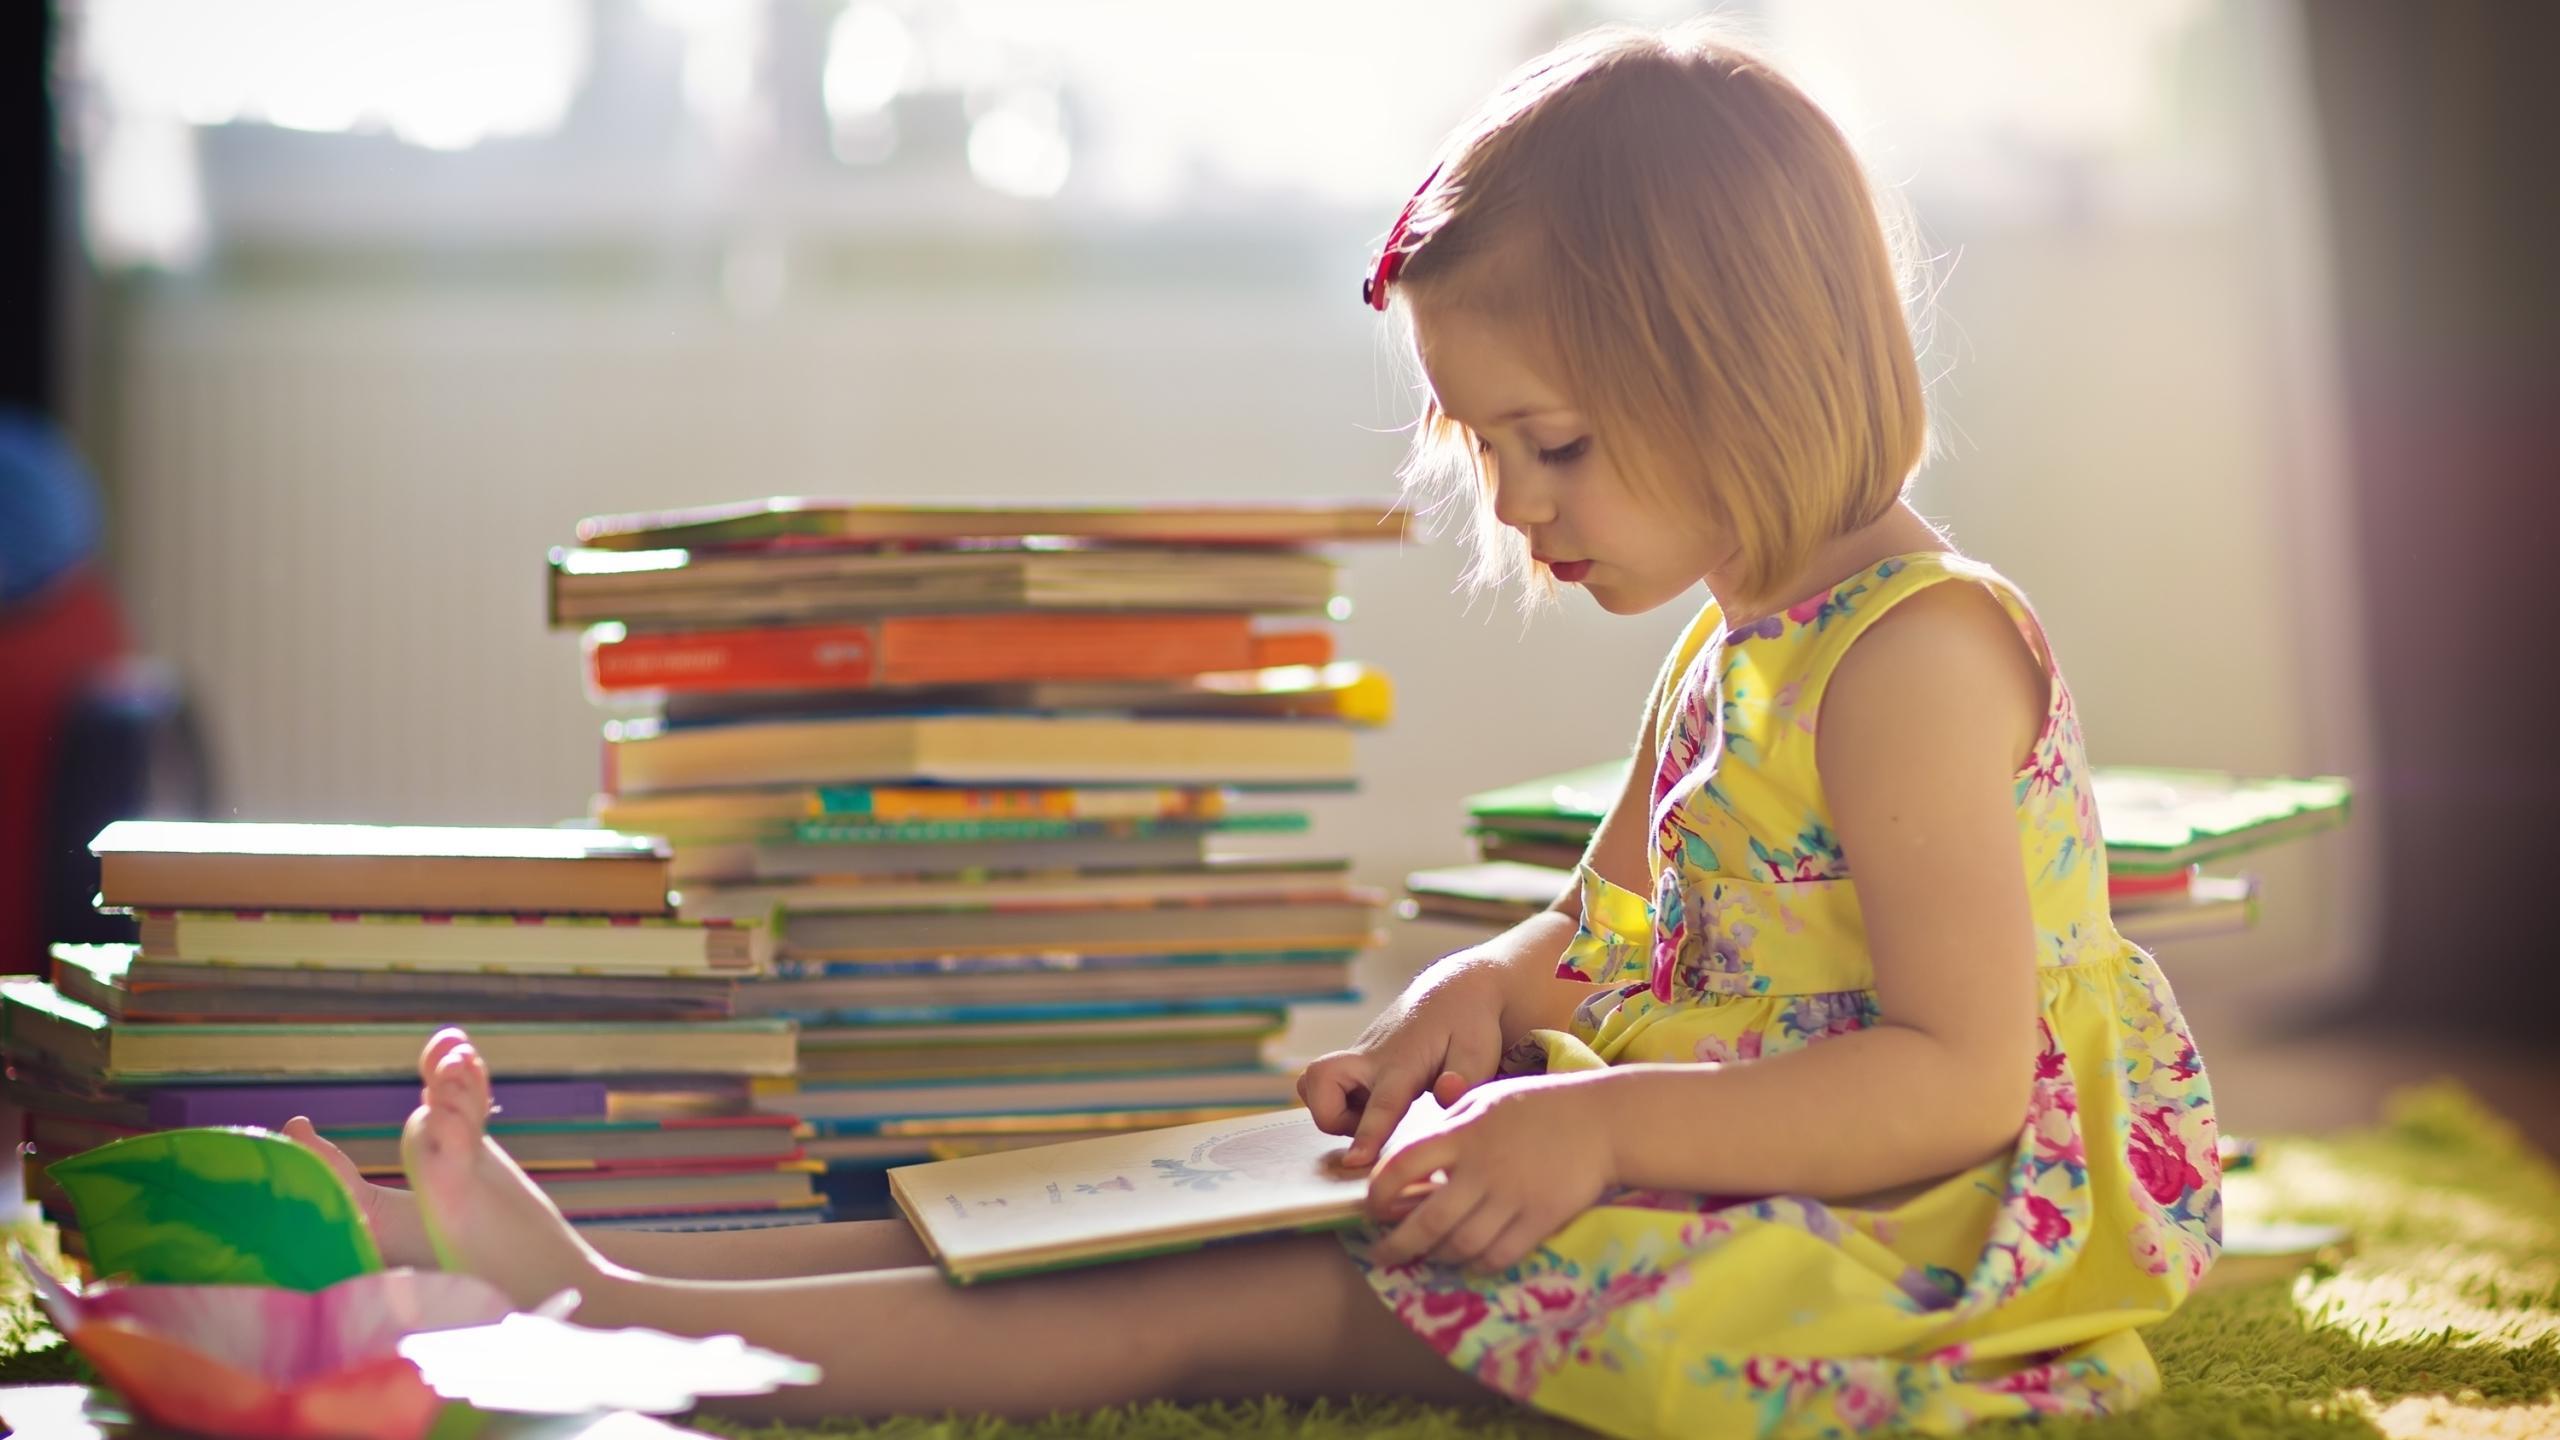 ЭЭГ предскажет успехи в чтении